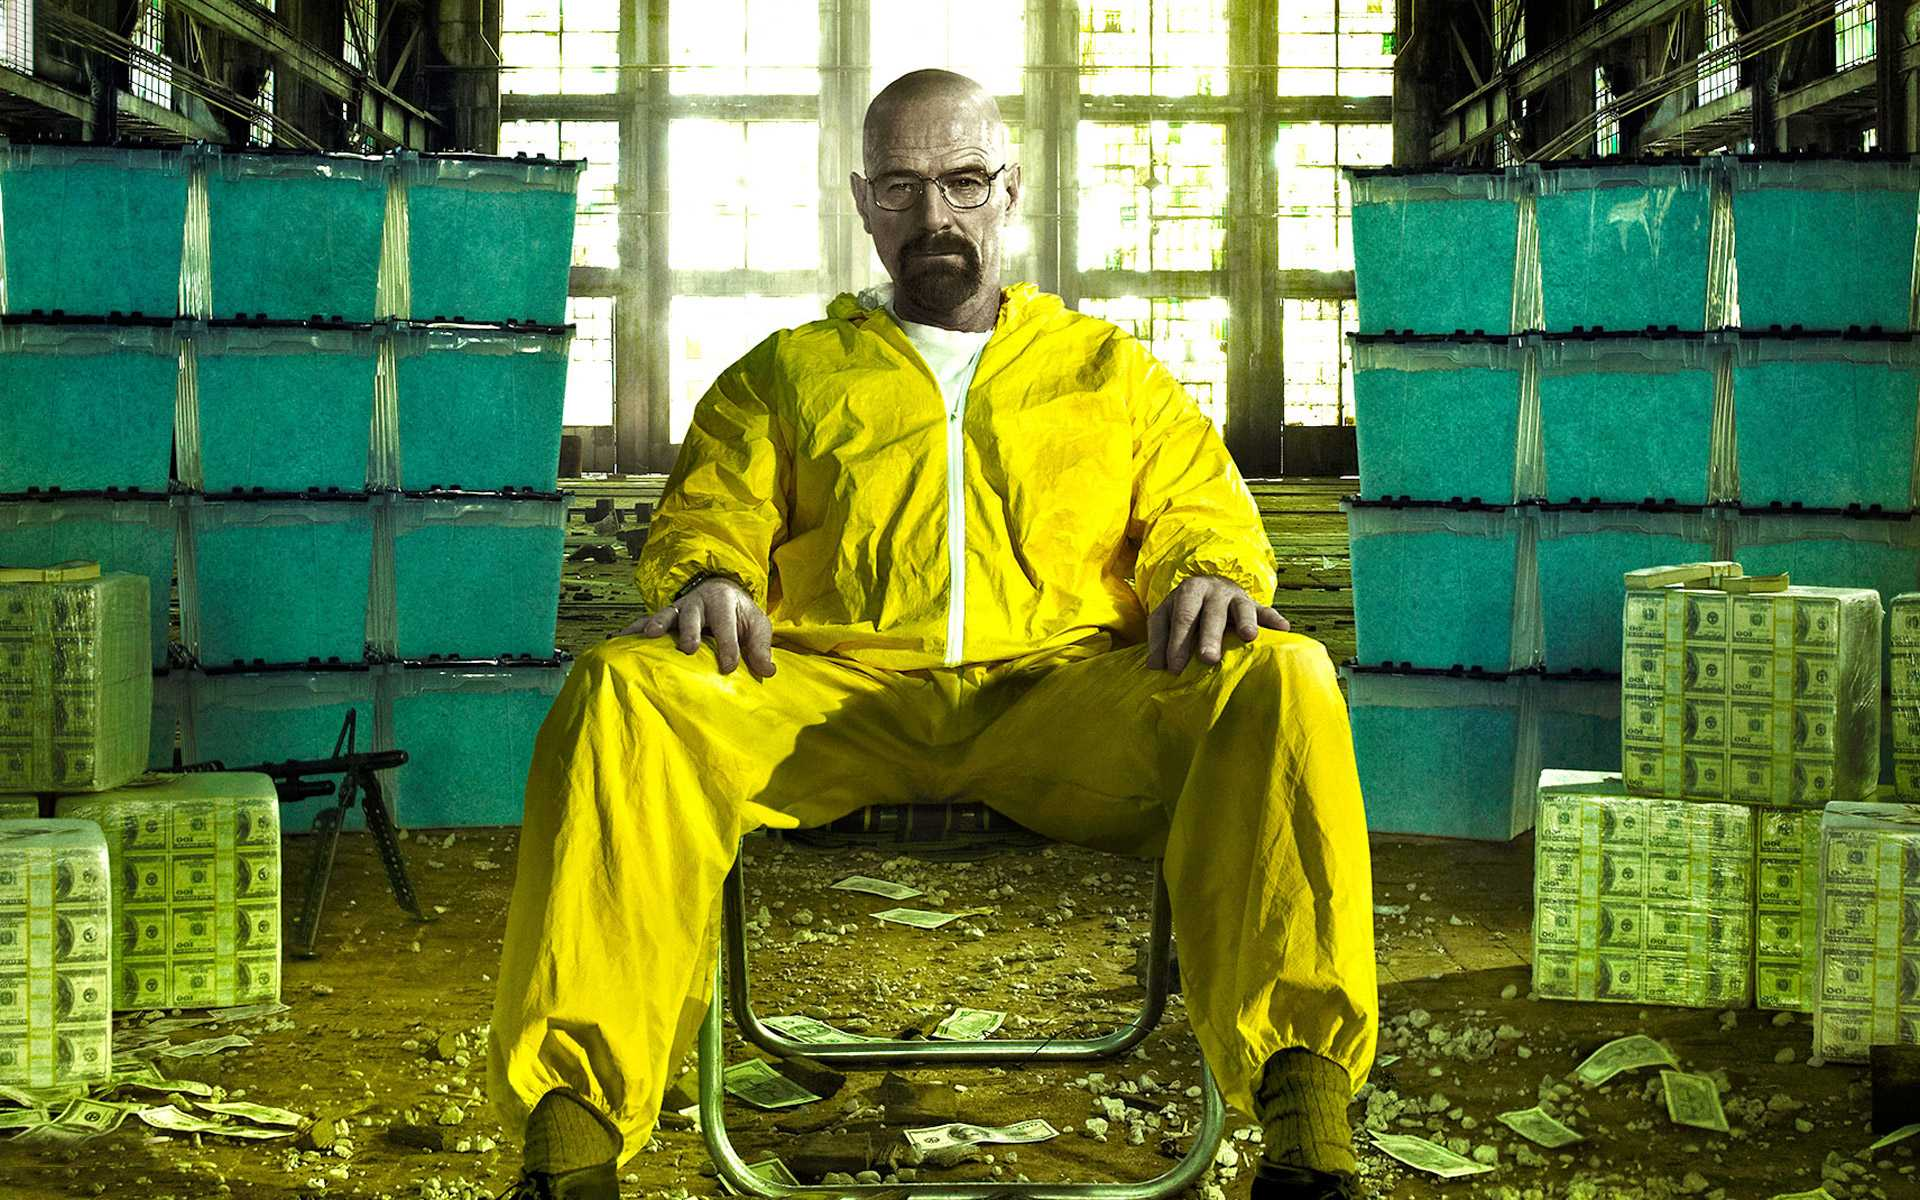 'Breaking Bad': A breakthrough in the TV industry